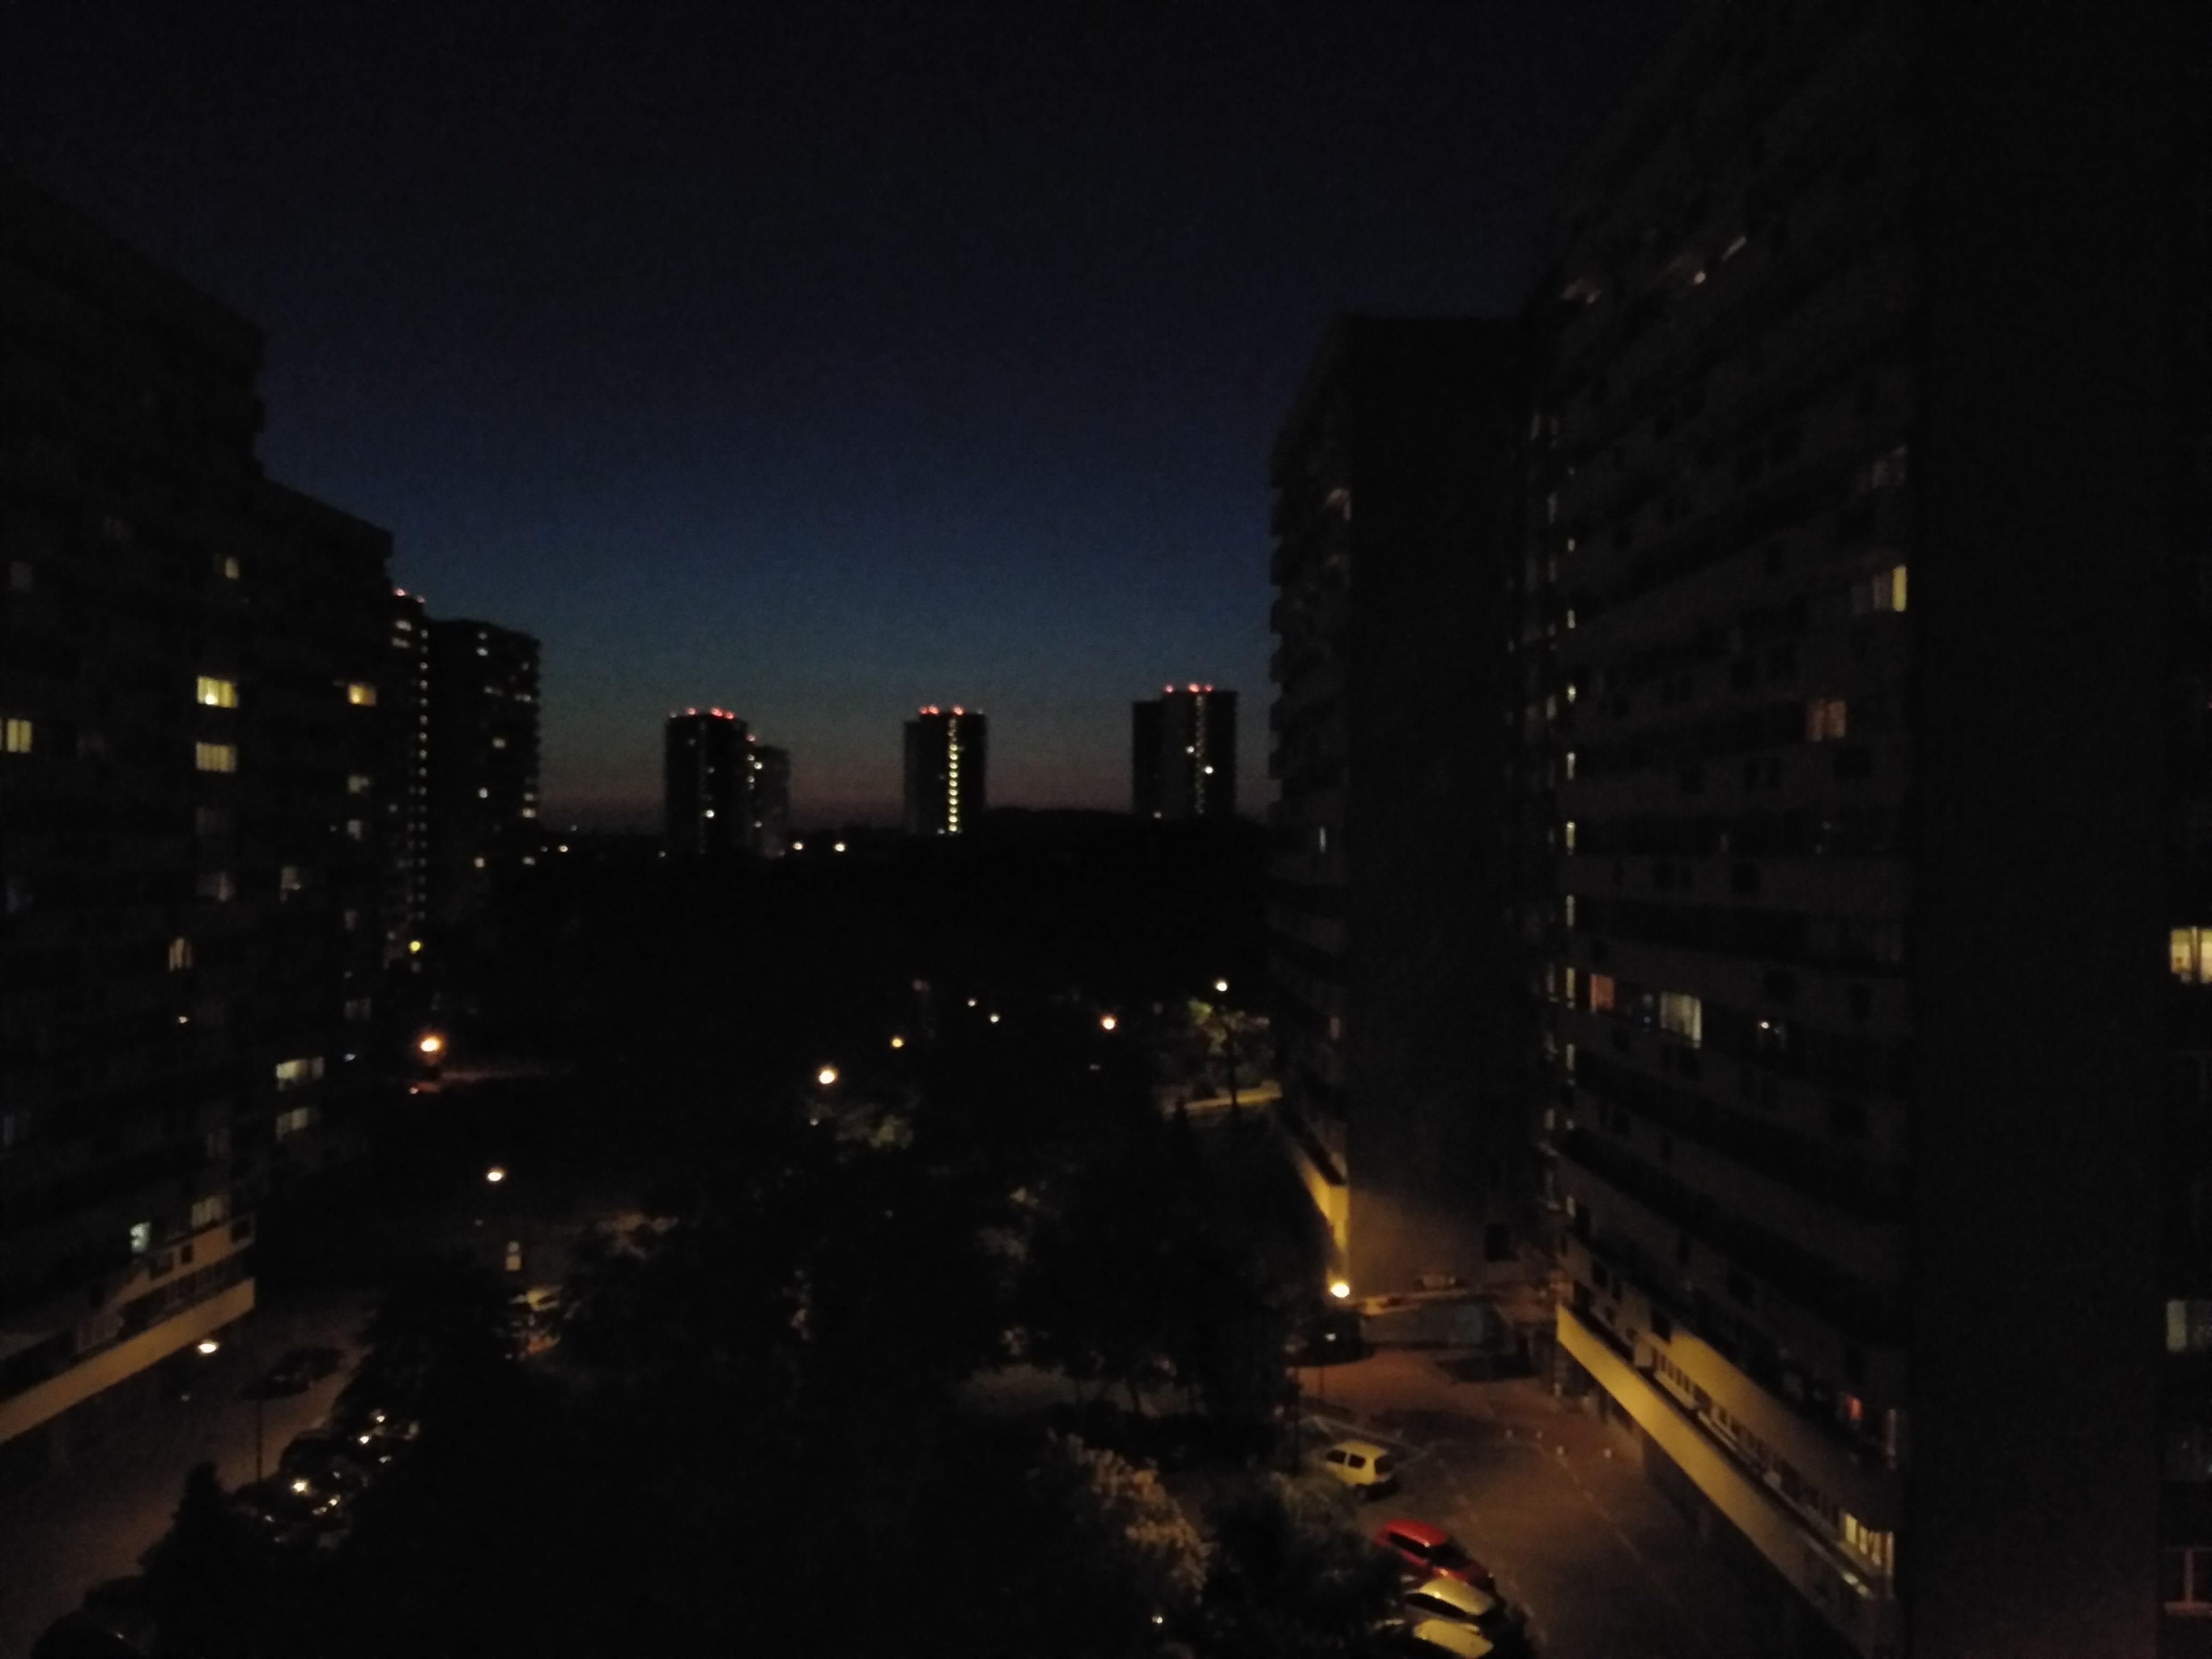 Zdjęcia nocne - Archos Diamond Alpha+